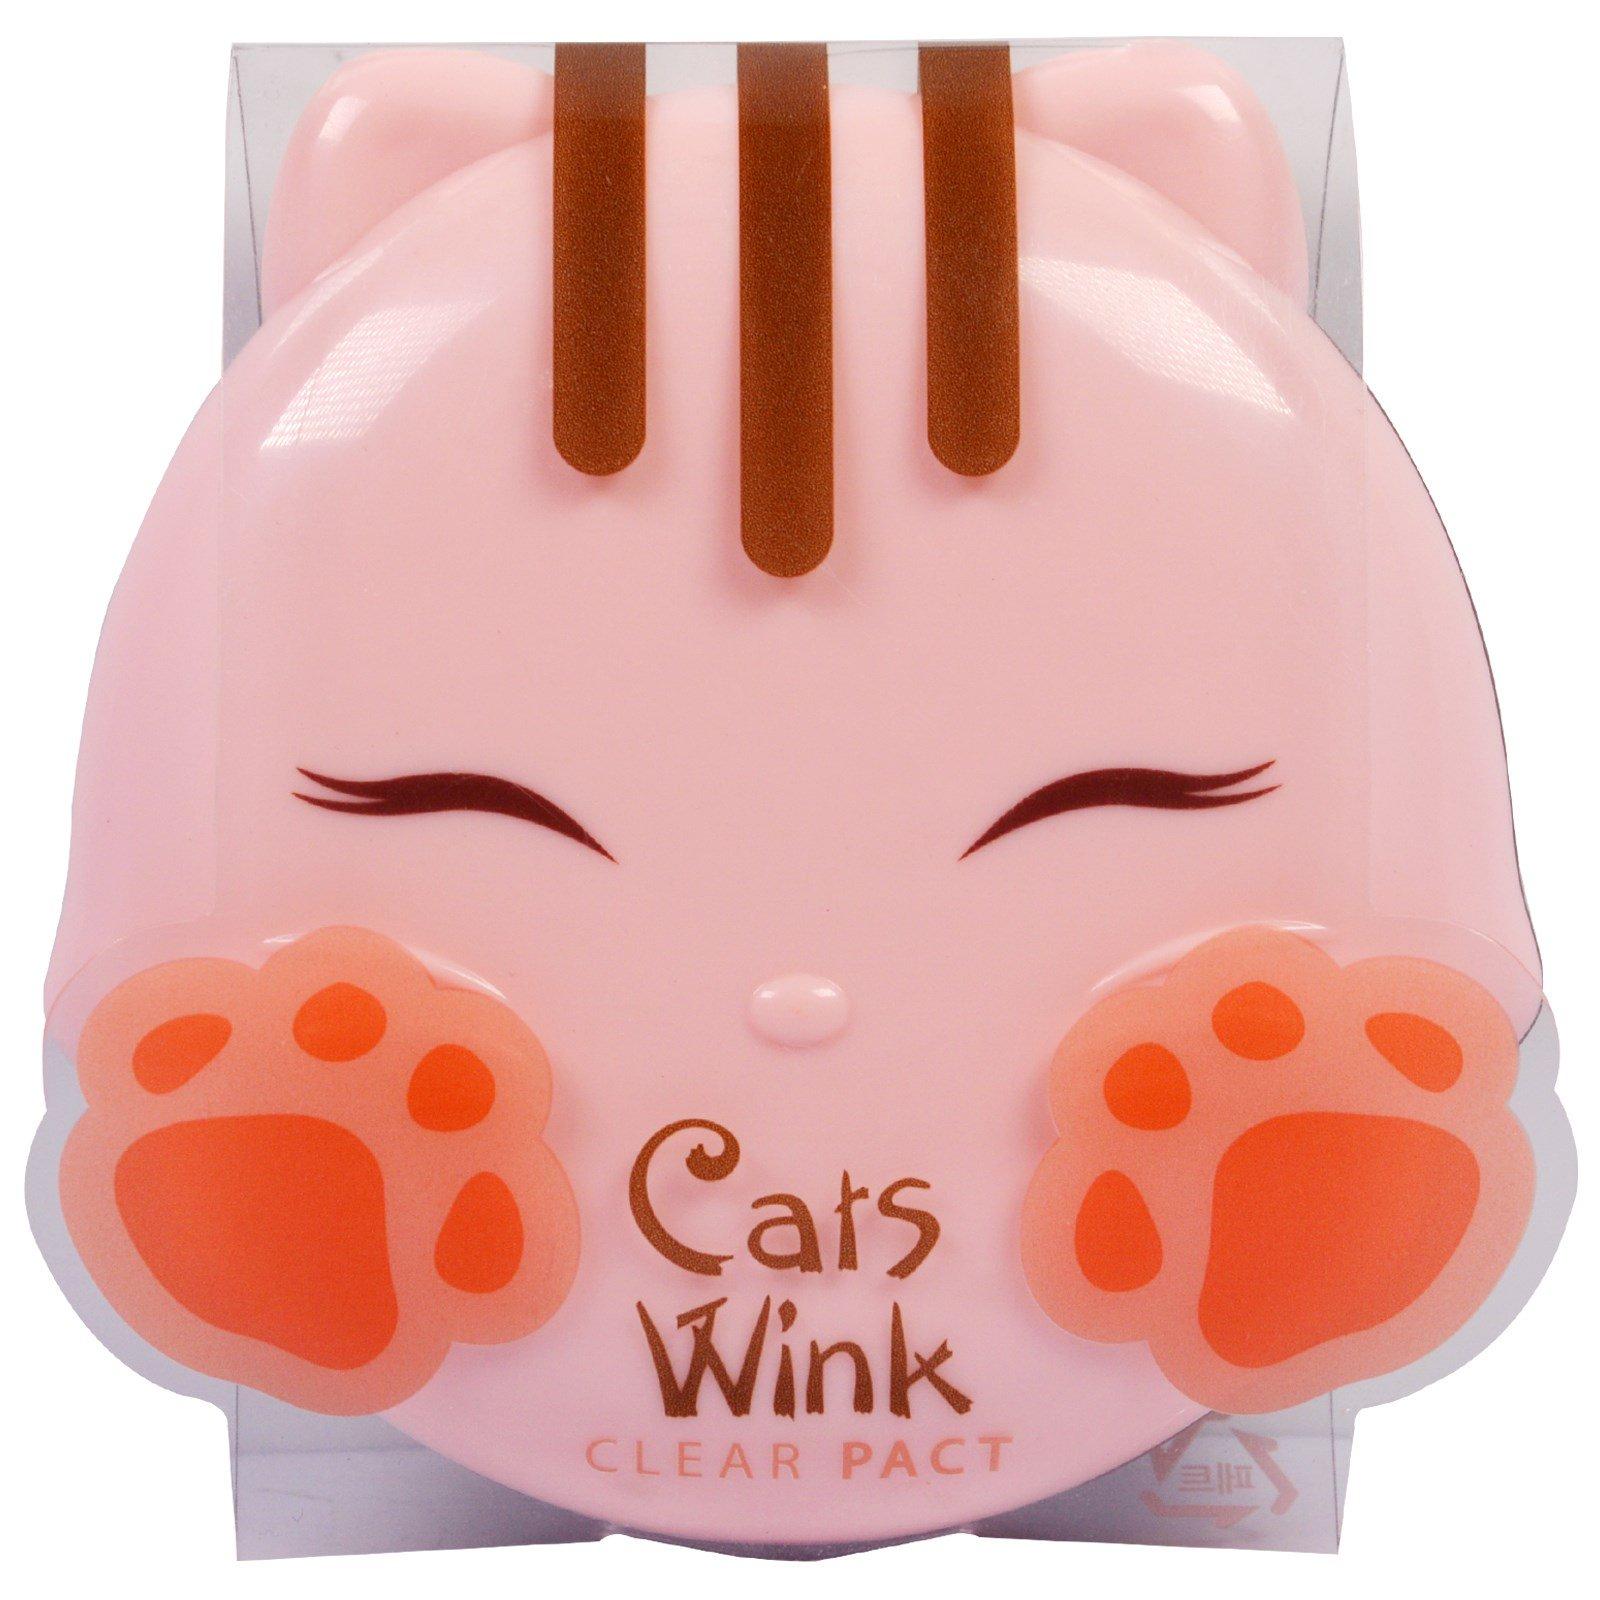 Tony Moly, Cat's Wink, Матирующая компактная пудра, Светло-бежевый оттенок, 0,38 унций (11 г)